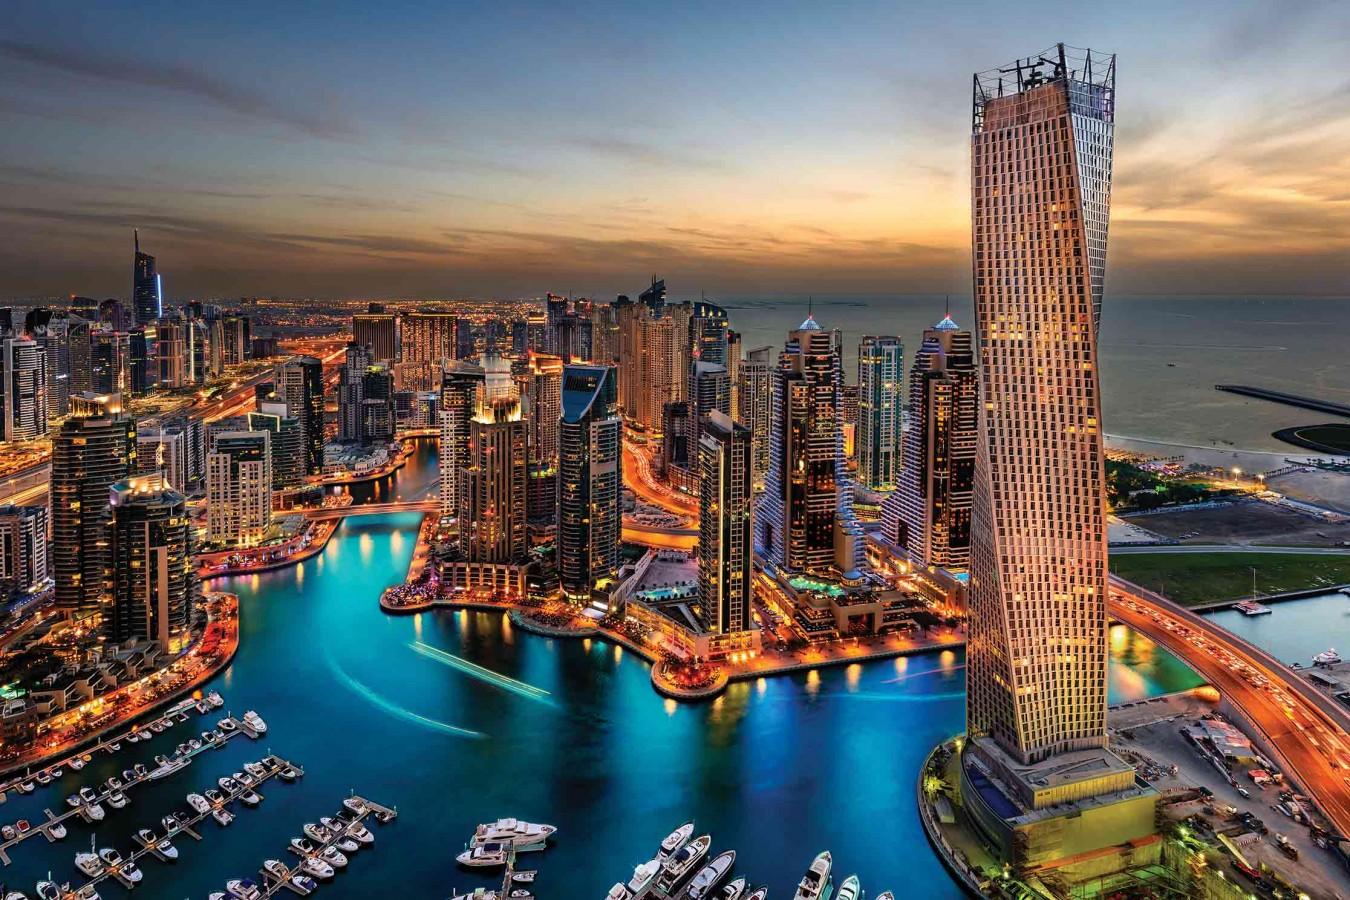 Fotomural Dubai Sky A08-M881 Fotomural Dubai Sky A08-M881